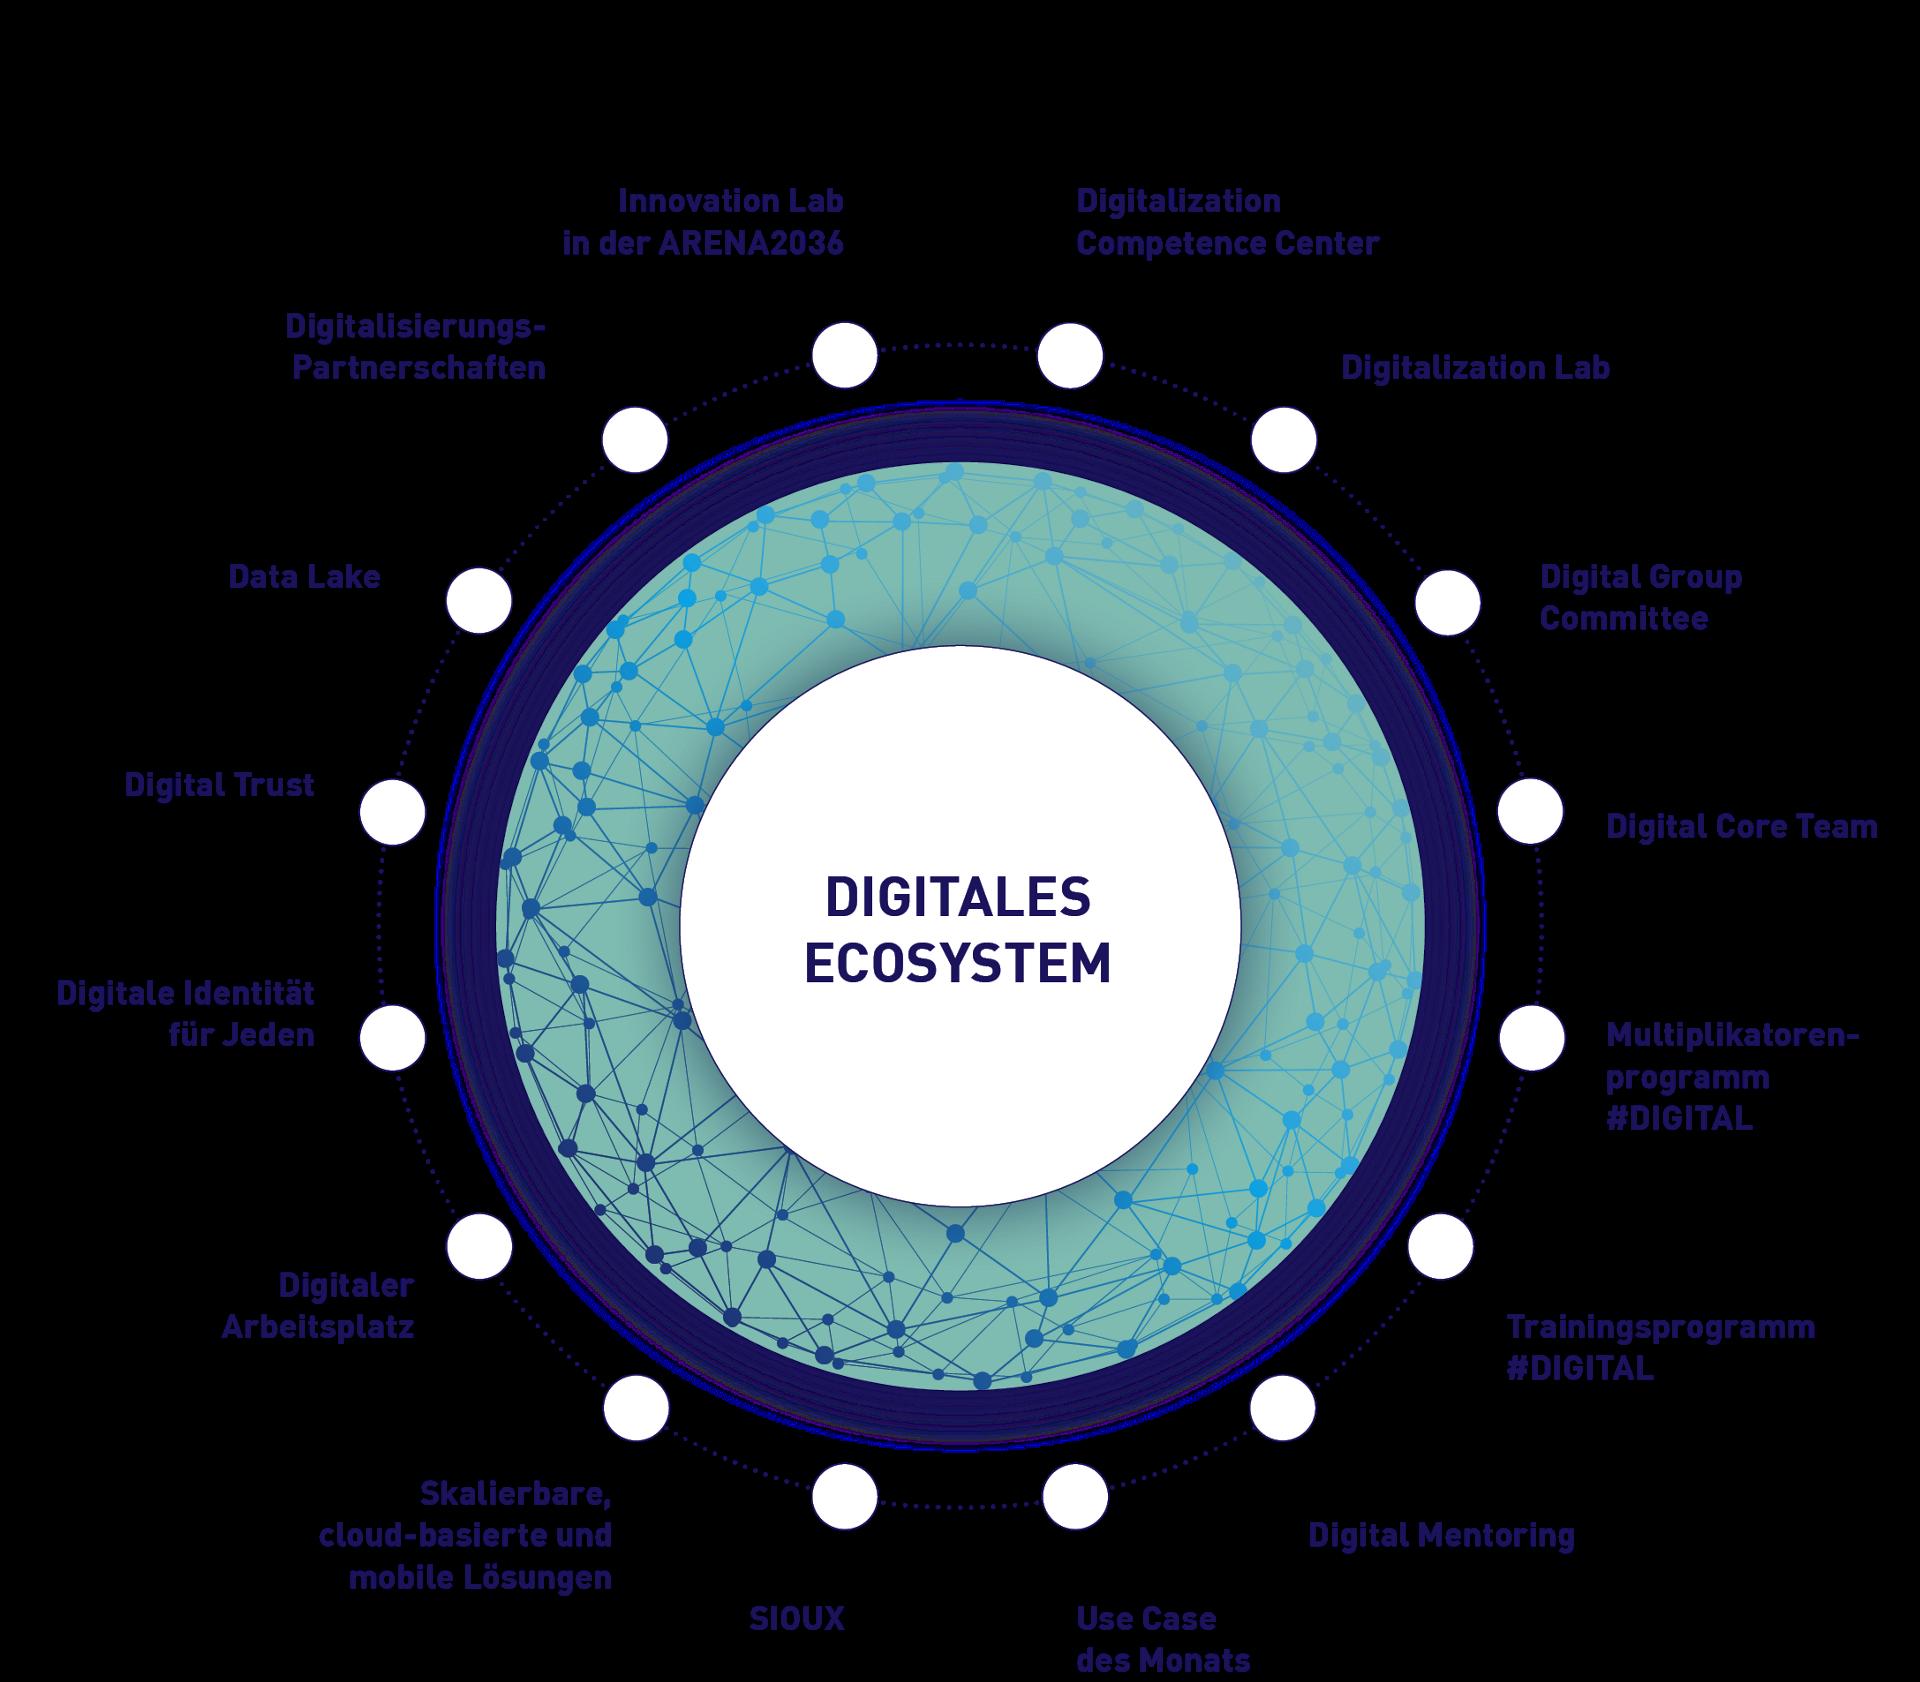 Digitales Ecosystem